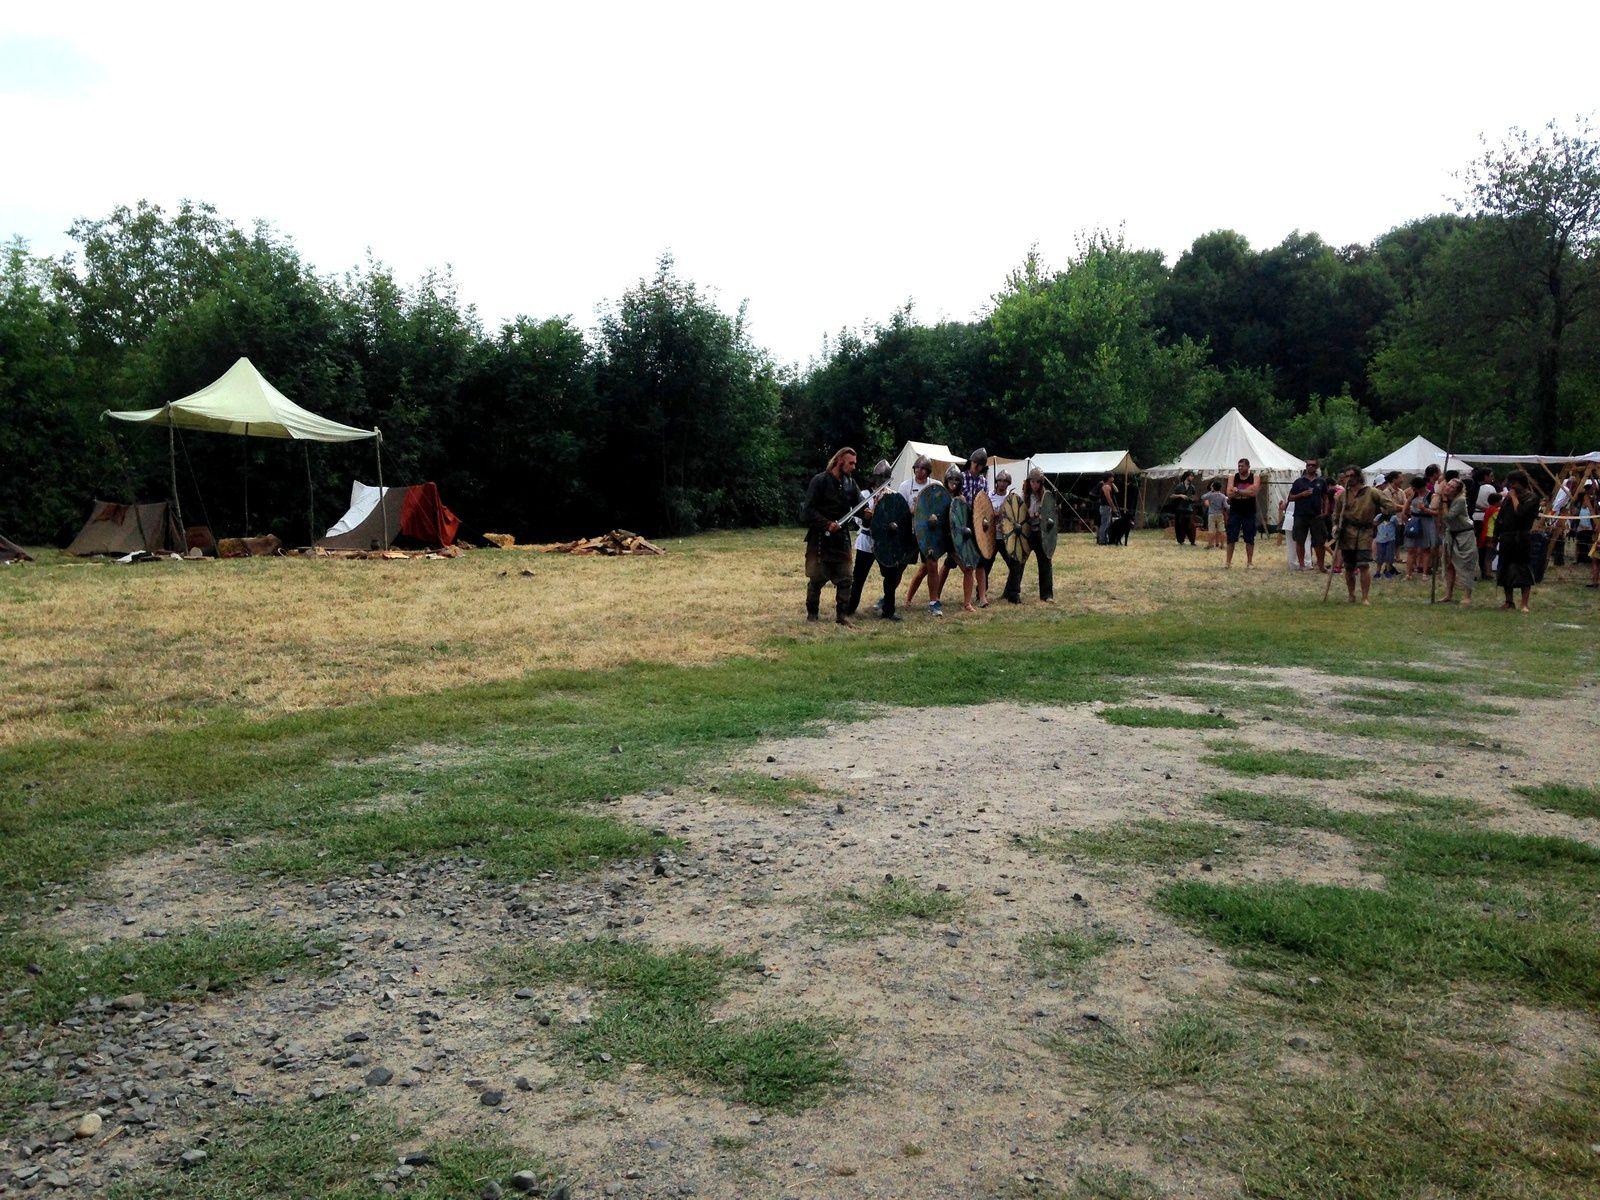 viking managarm - festival charivari Billom, Auvergne, Puy de dôme, France. sur charlotteblabla blog*